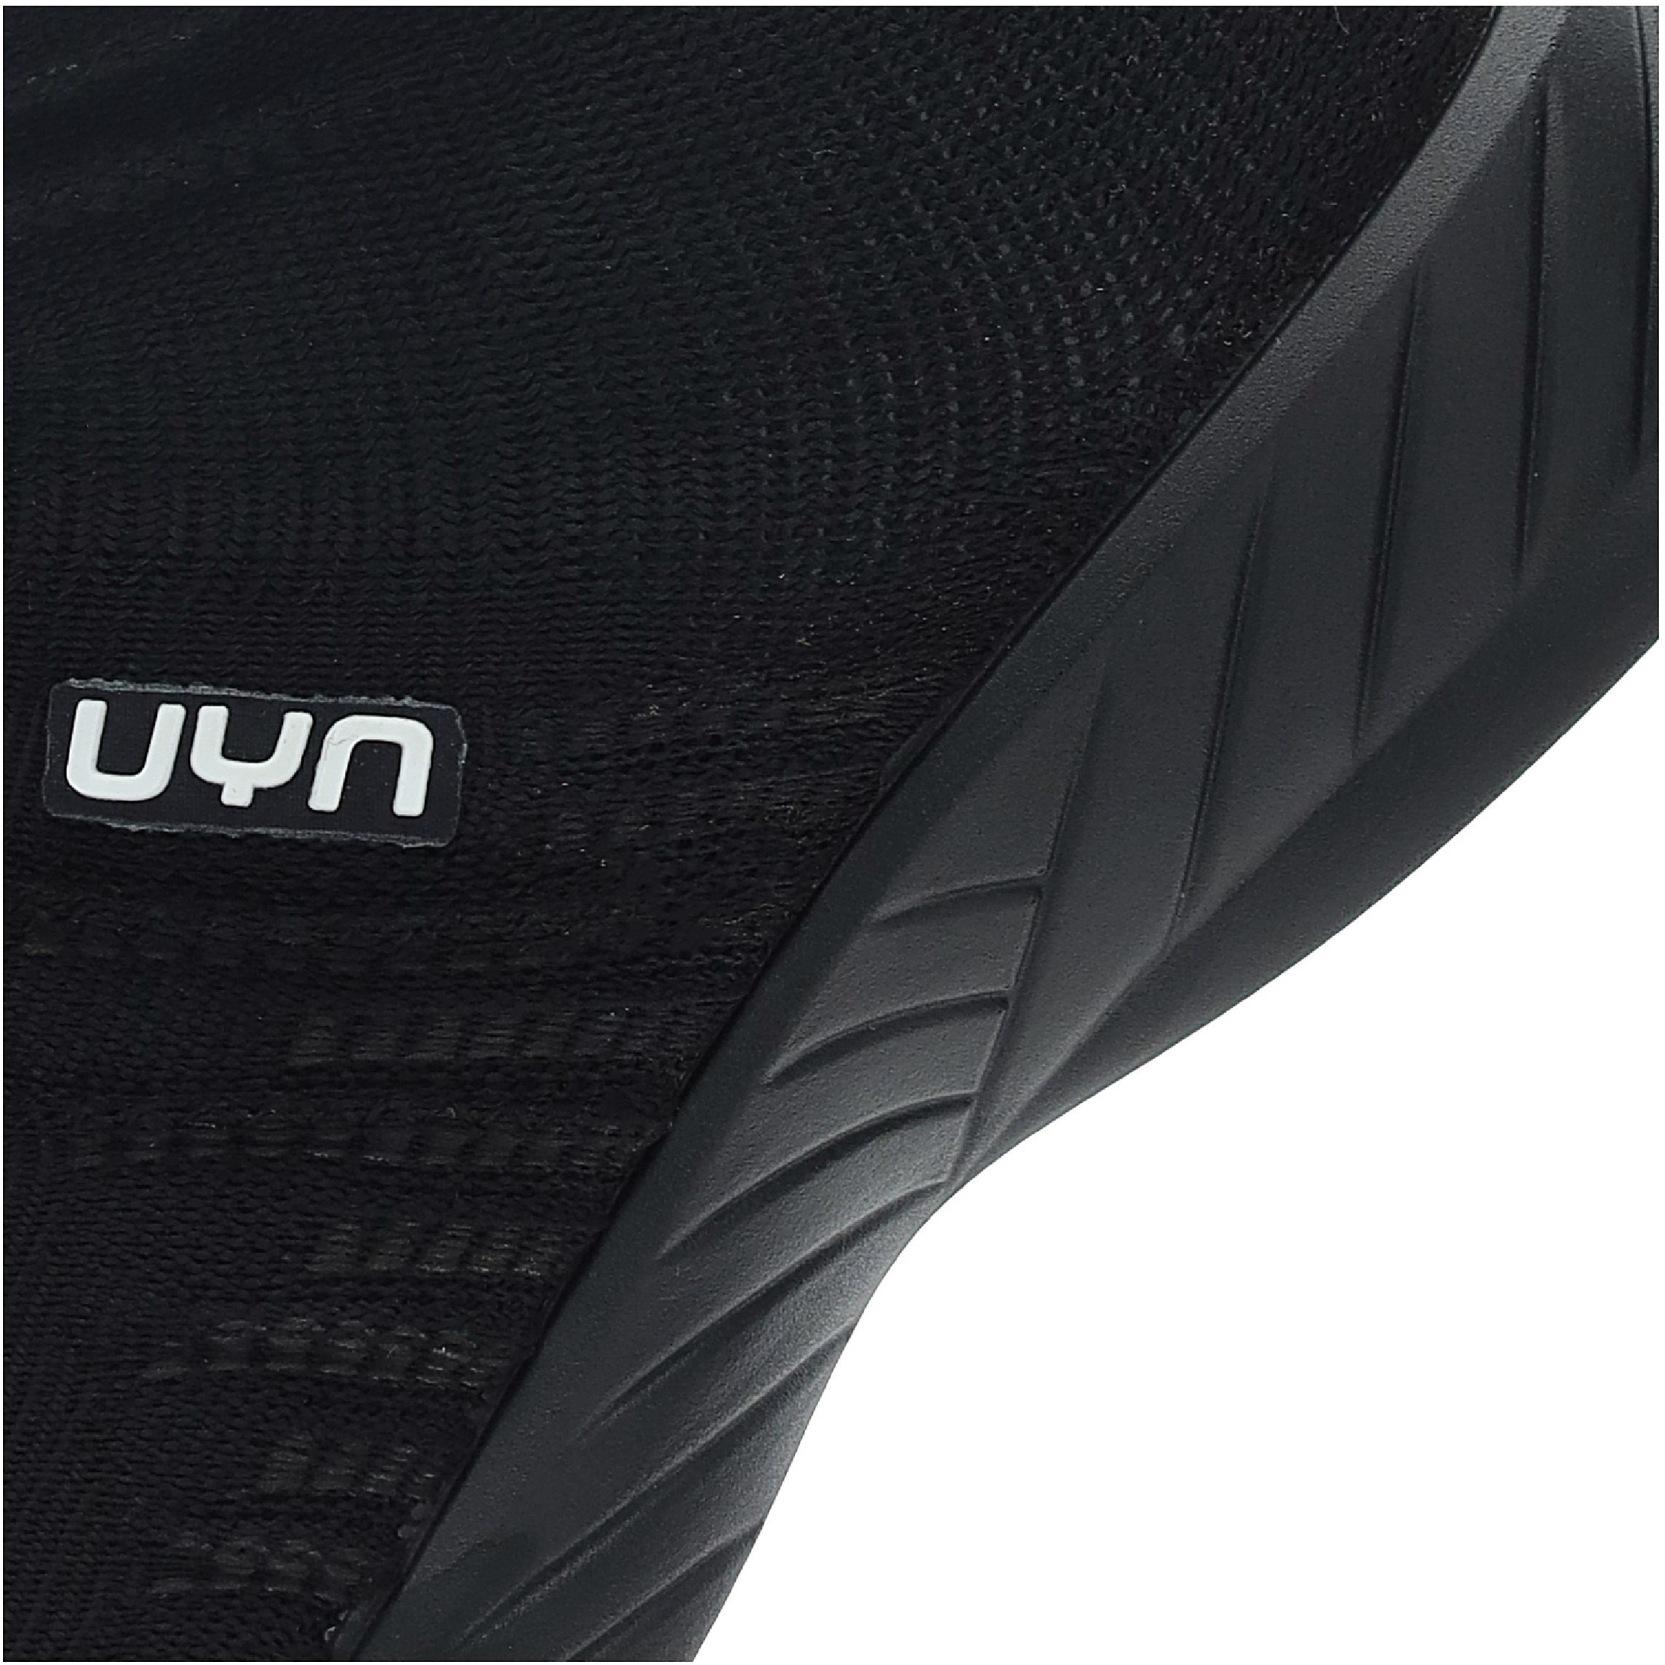 Bild von UYN X-Cross Black Sole Laufschuhe - Optical Black/Black